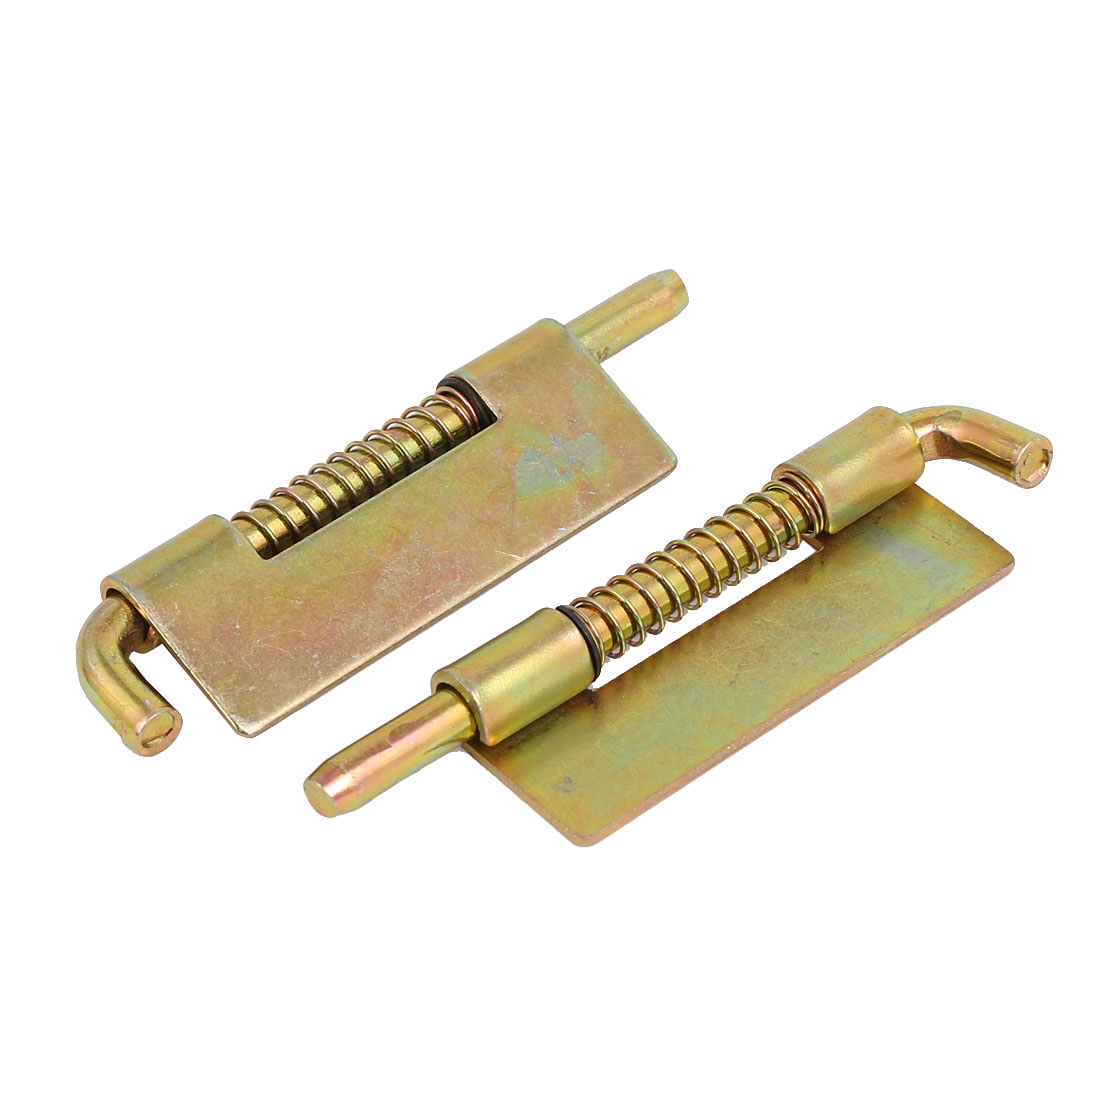 85mm Length Metal Spring Loaded Door Security Barrel Bolt Latch Bronze Tone 2pcs